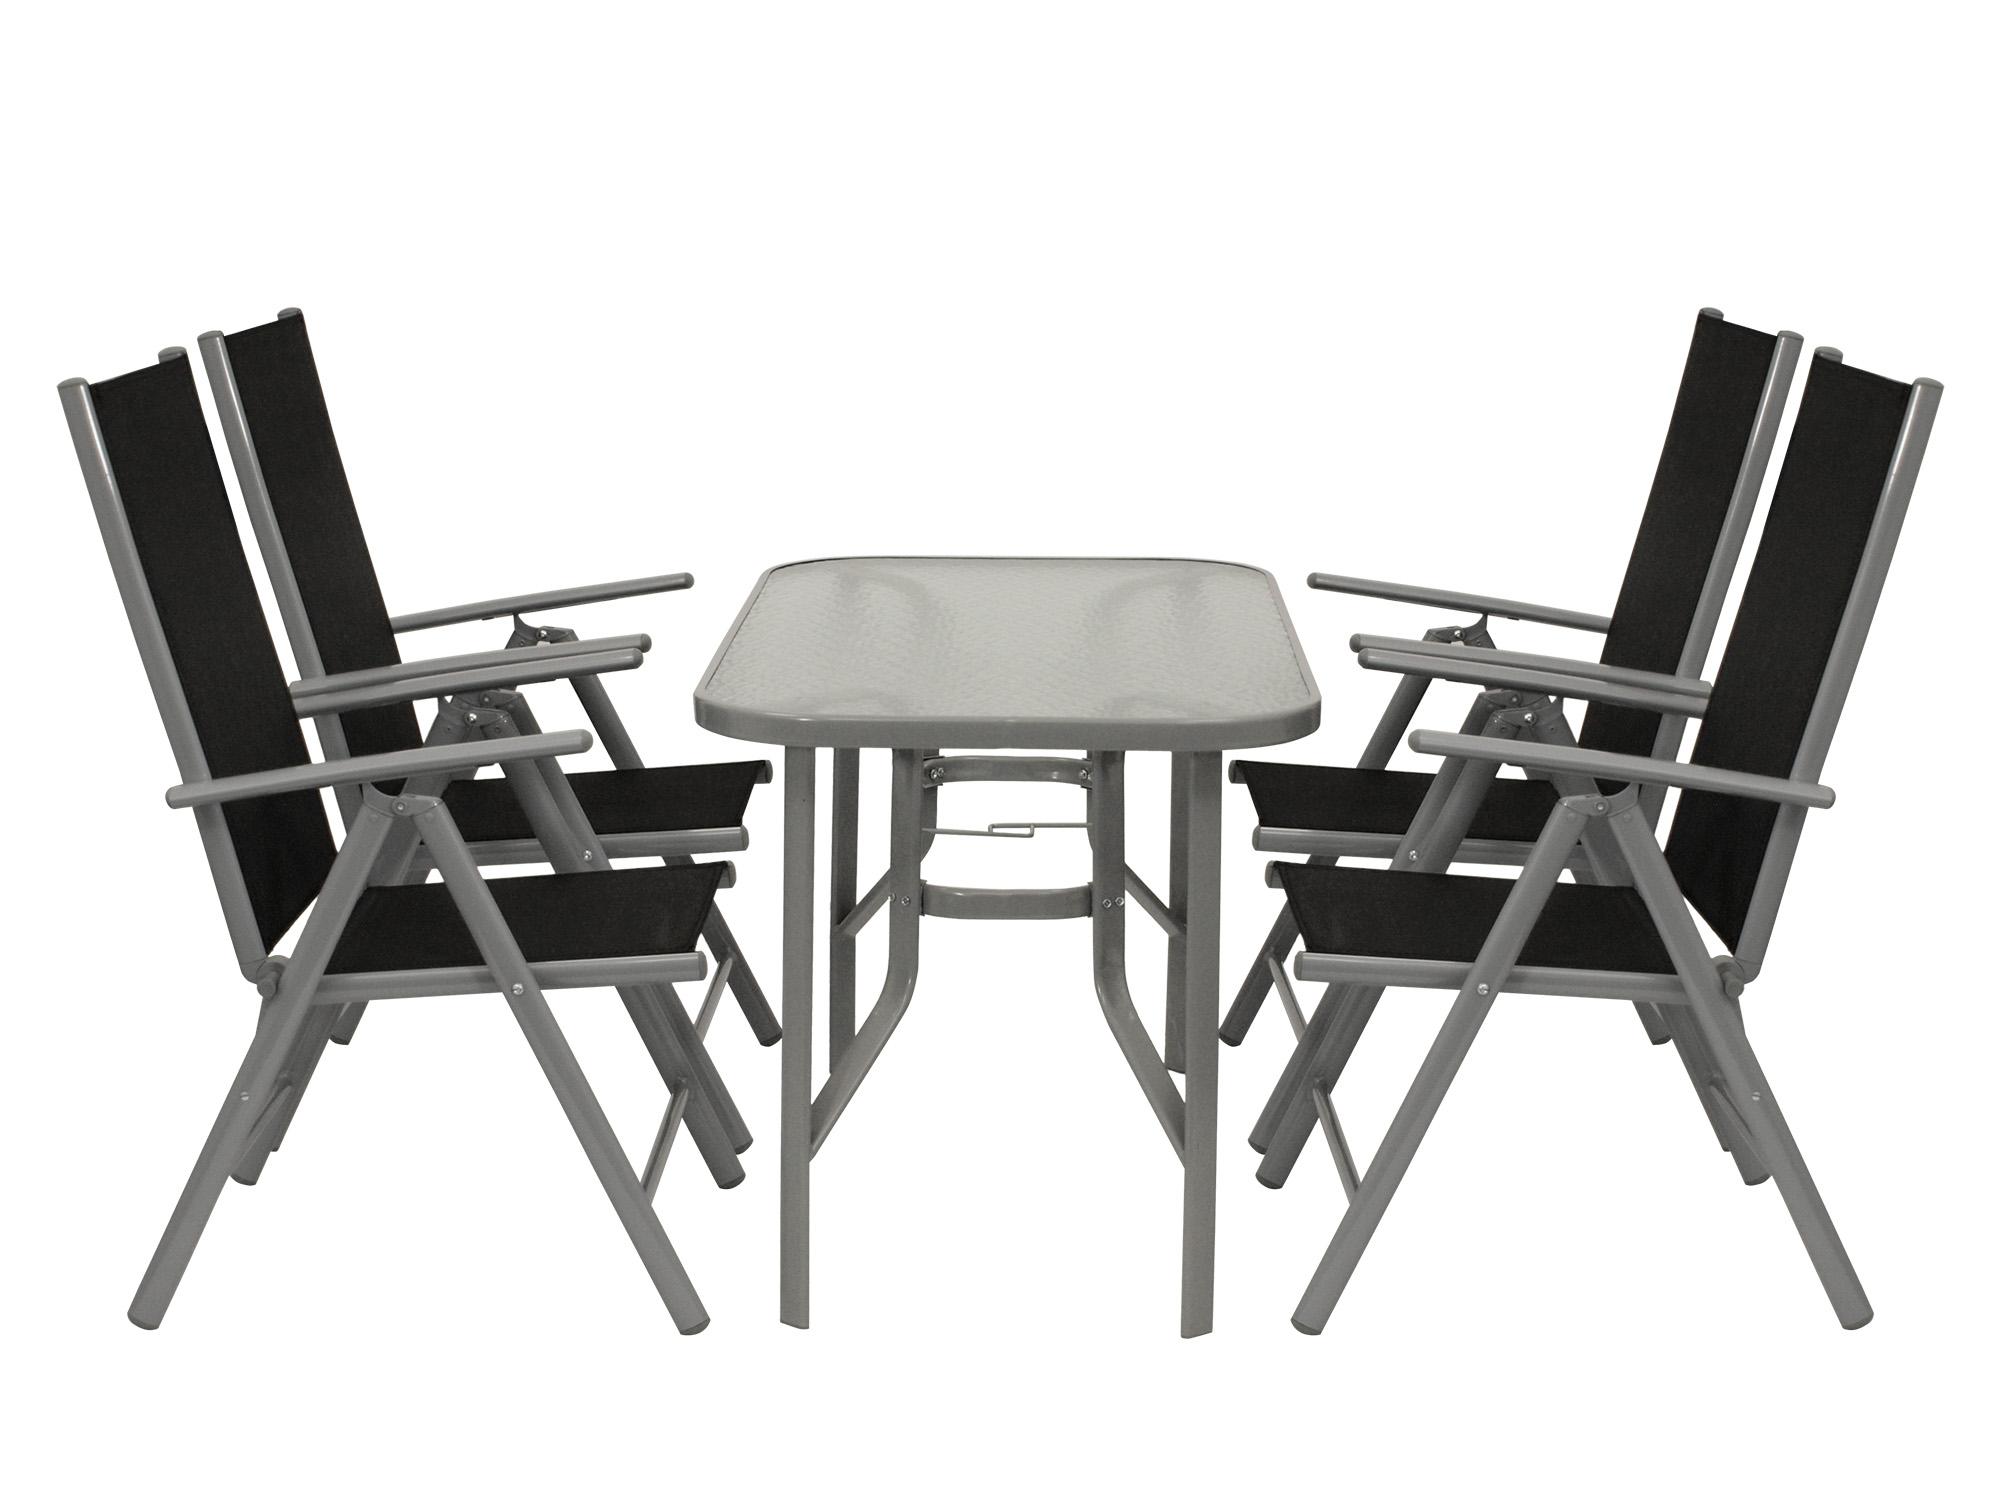 gartengarnitur sitzgruppe gartenm bel set garnitur gartenset ravenna 5 teilig ebay. Black Bedroom Furniture Sets. Home Design Ideas